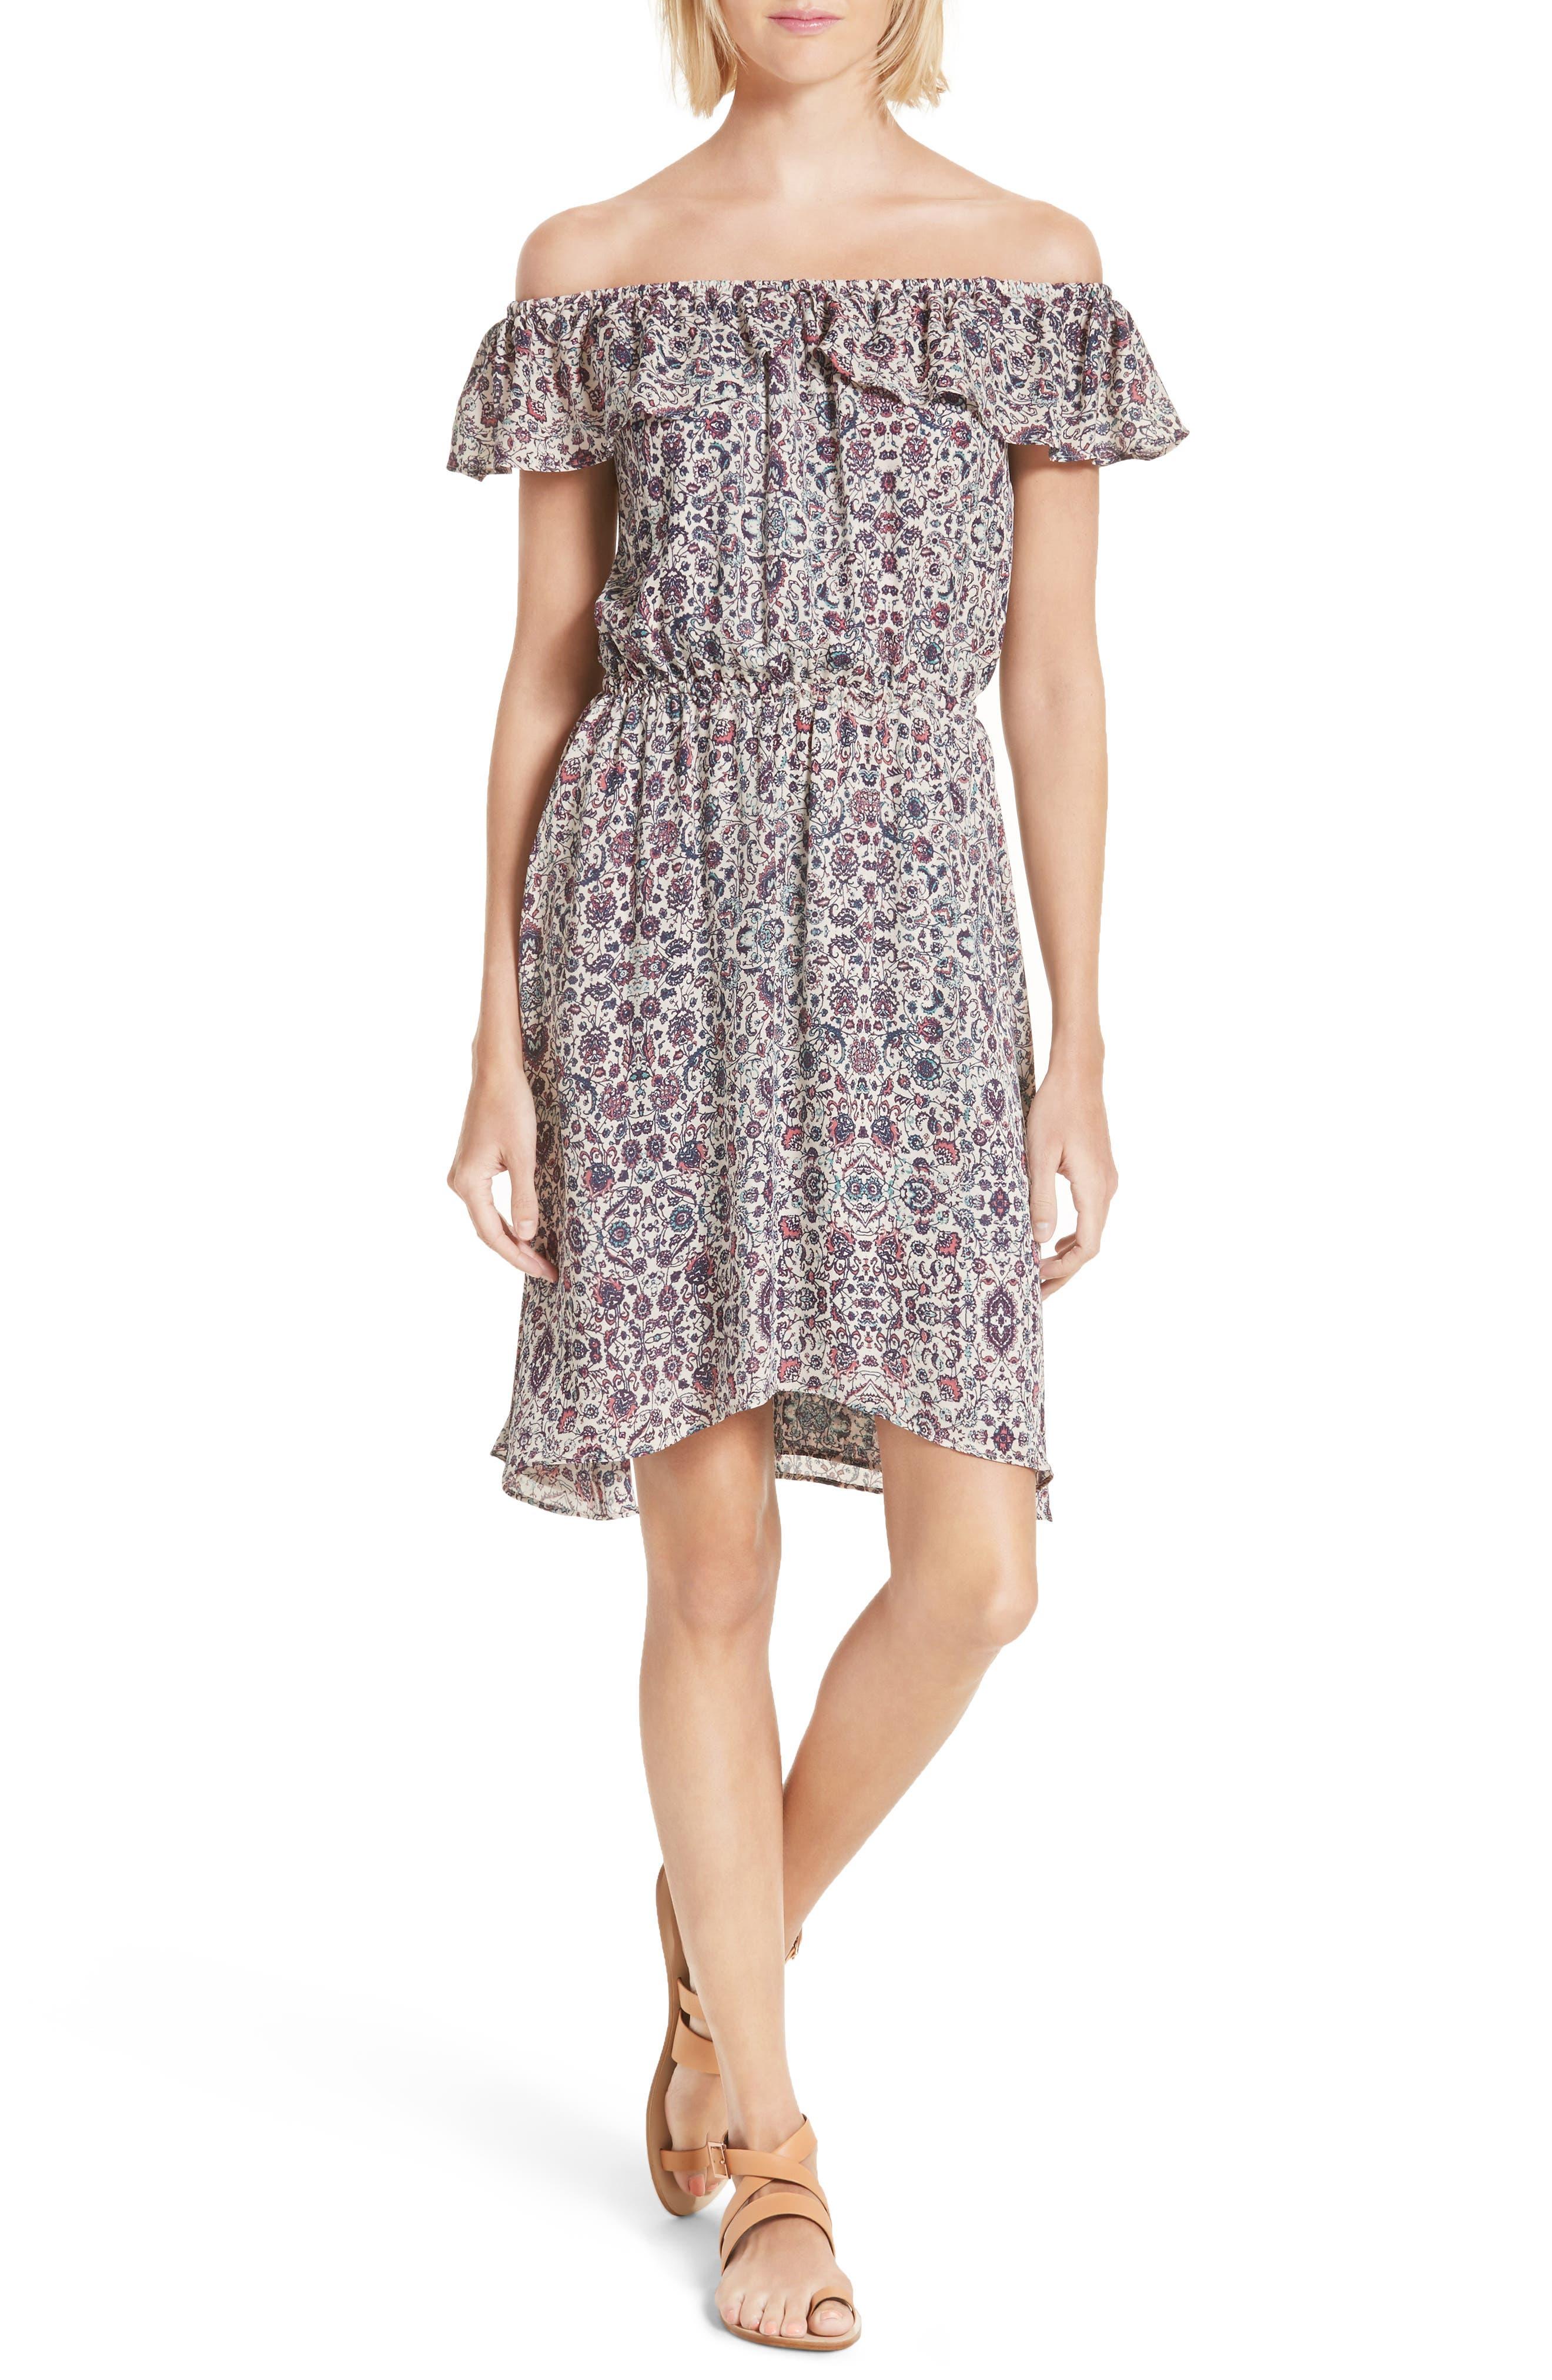 L'AGENCE Leonie Print Off the Shoulder Dress